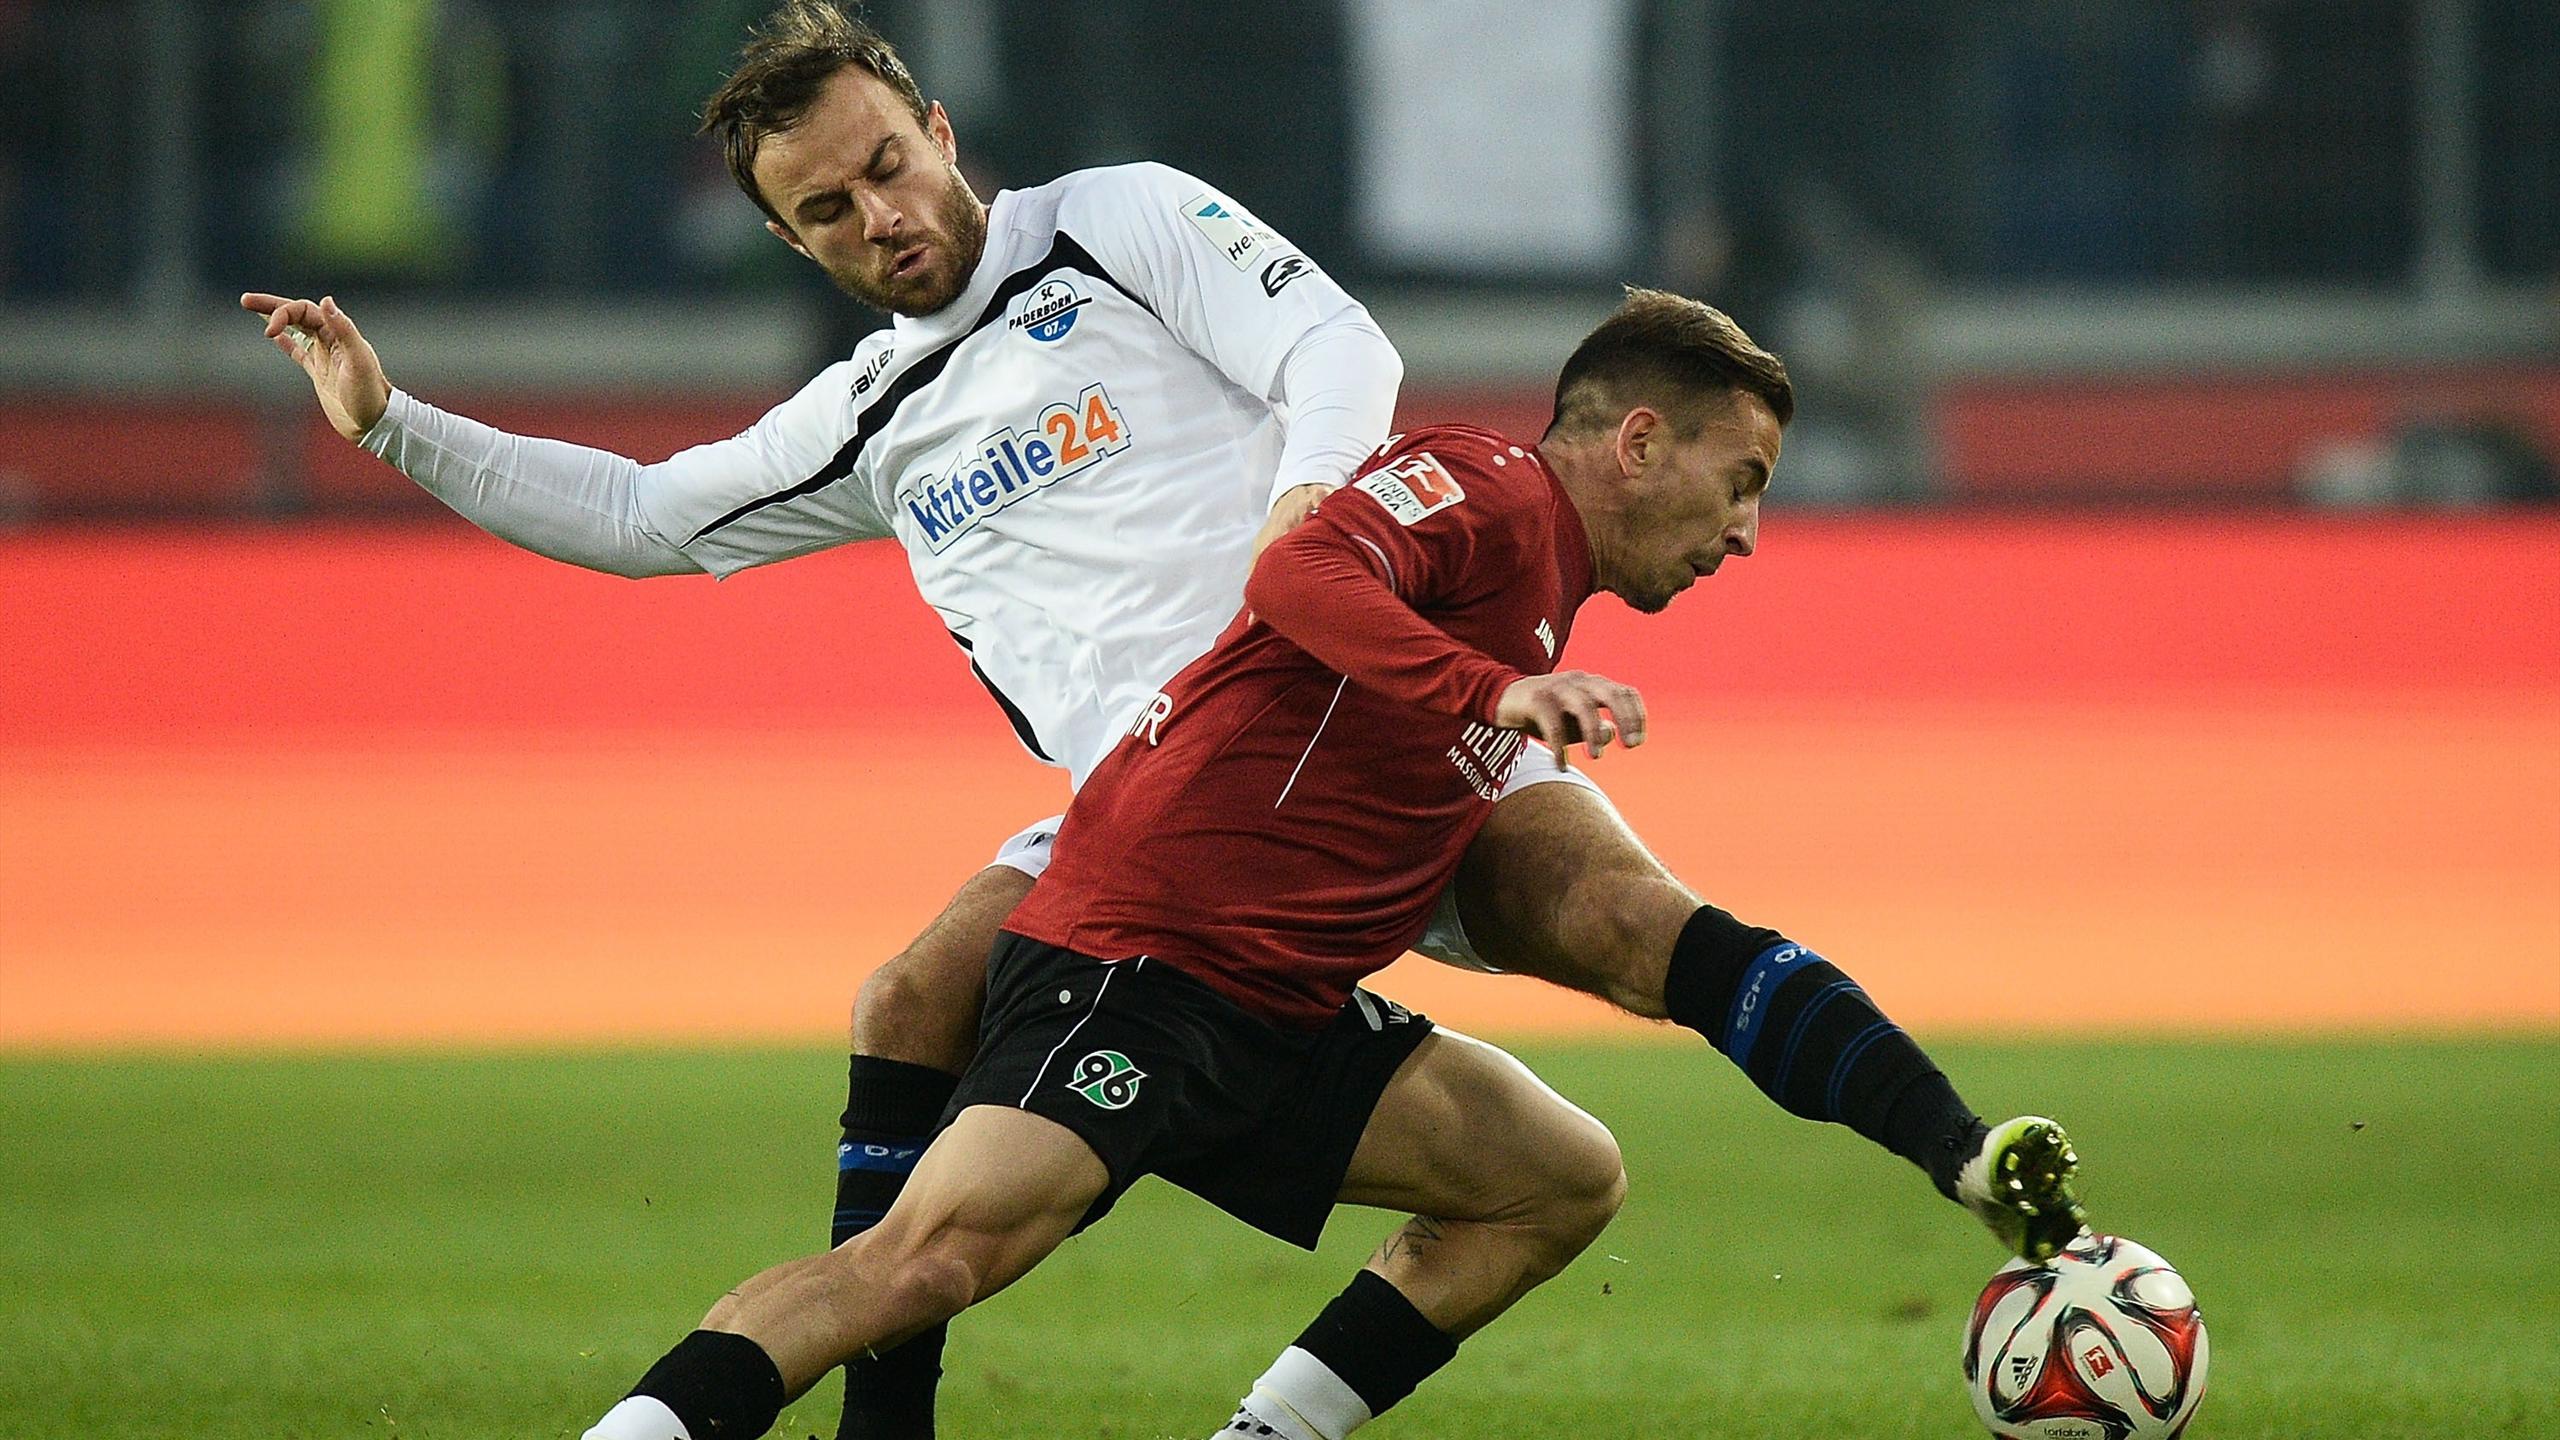 Video: Hannover 96 vs Paderborn